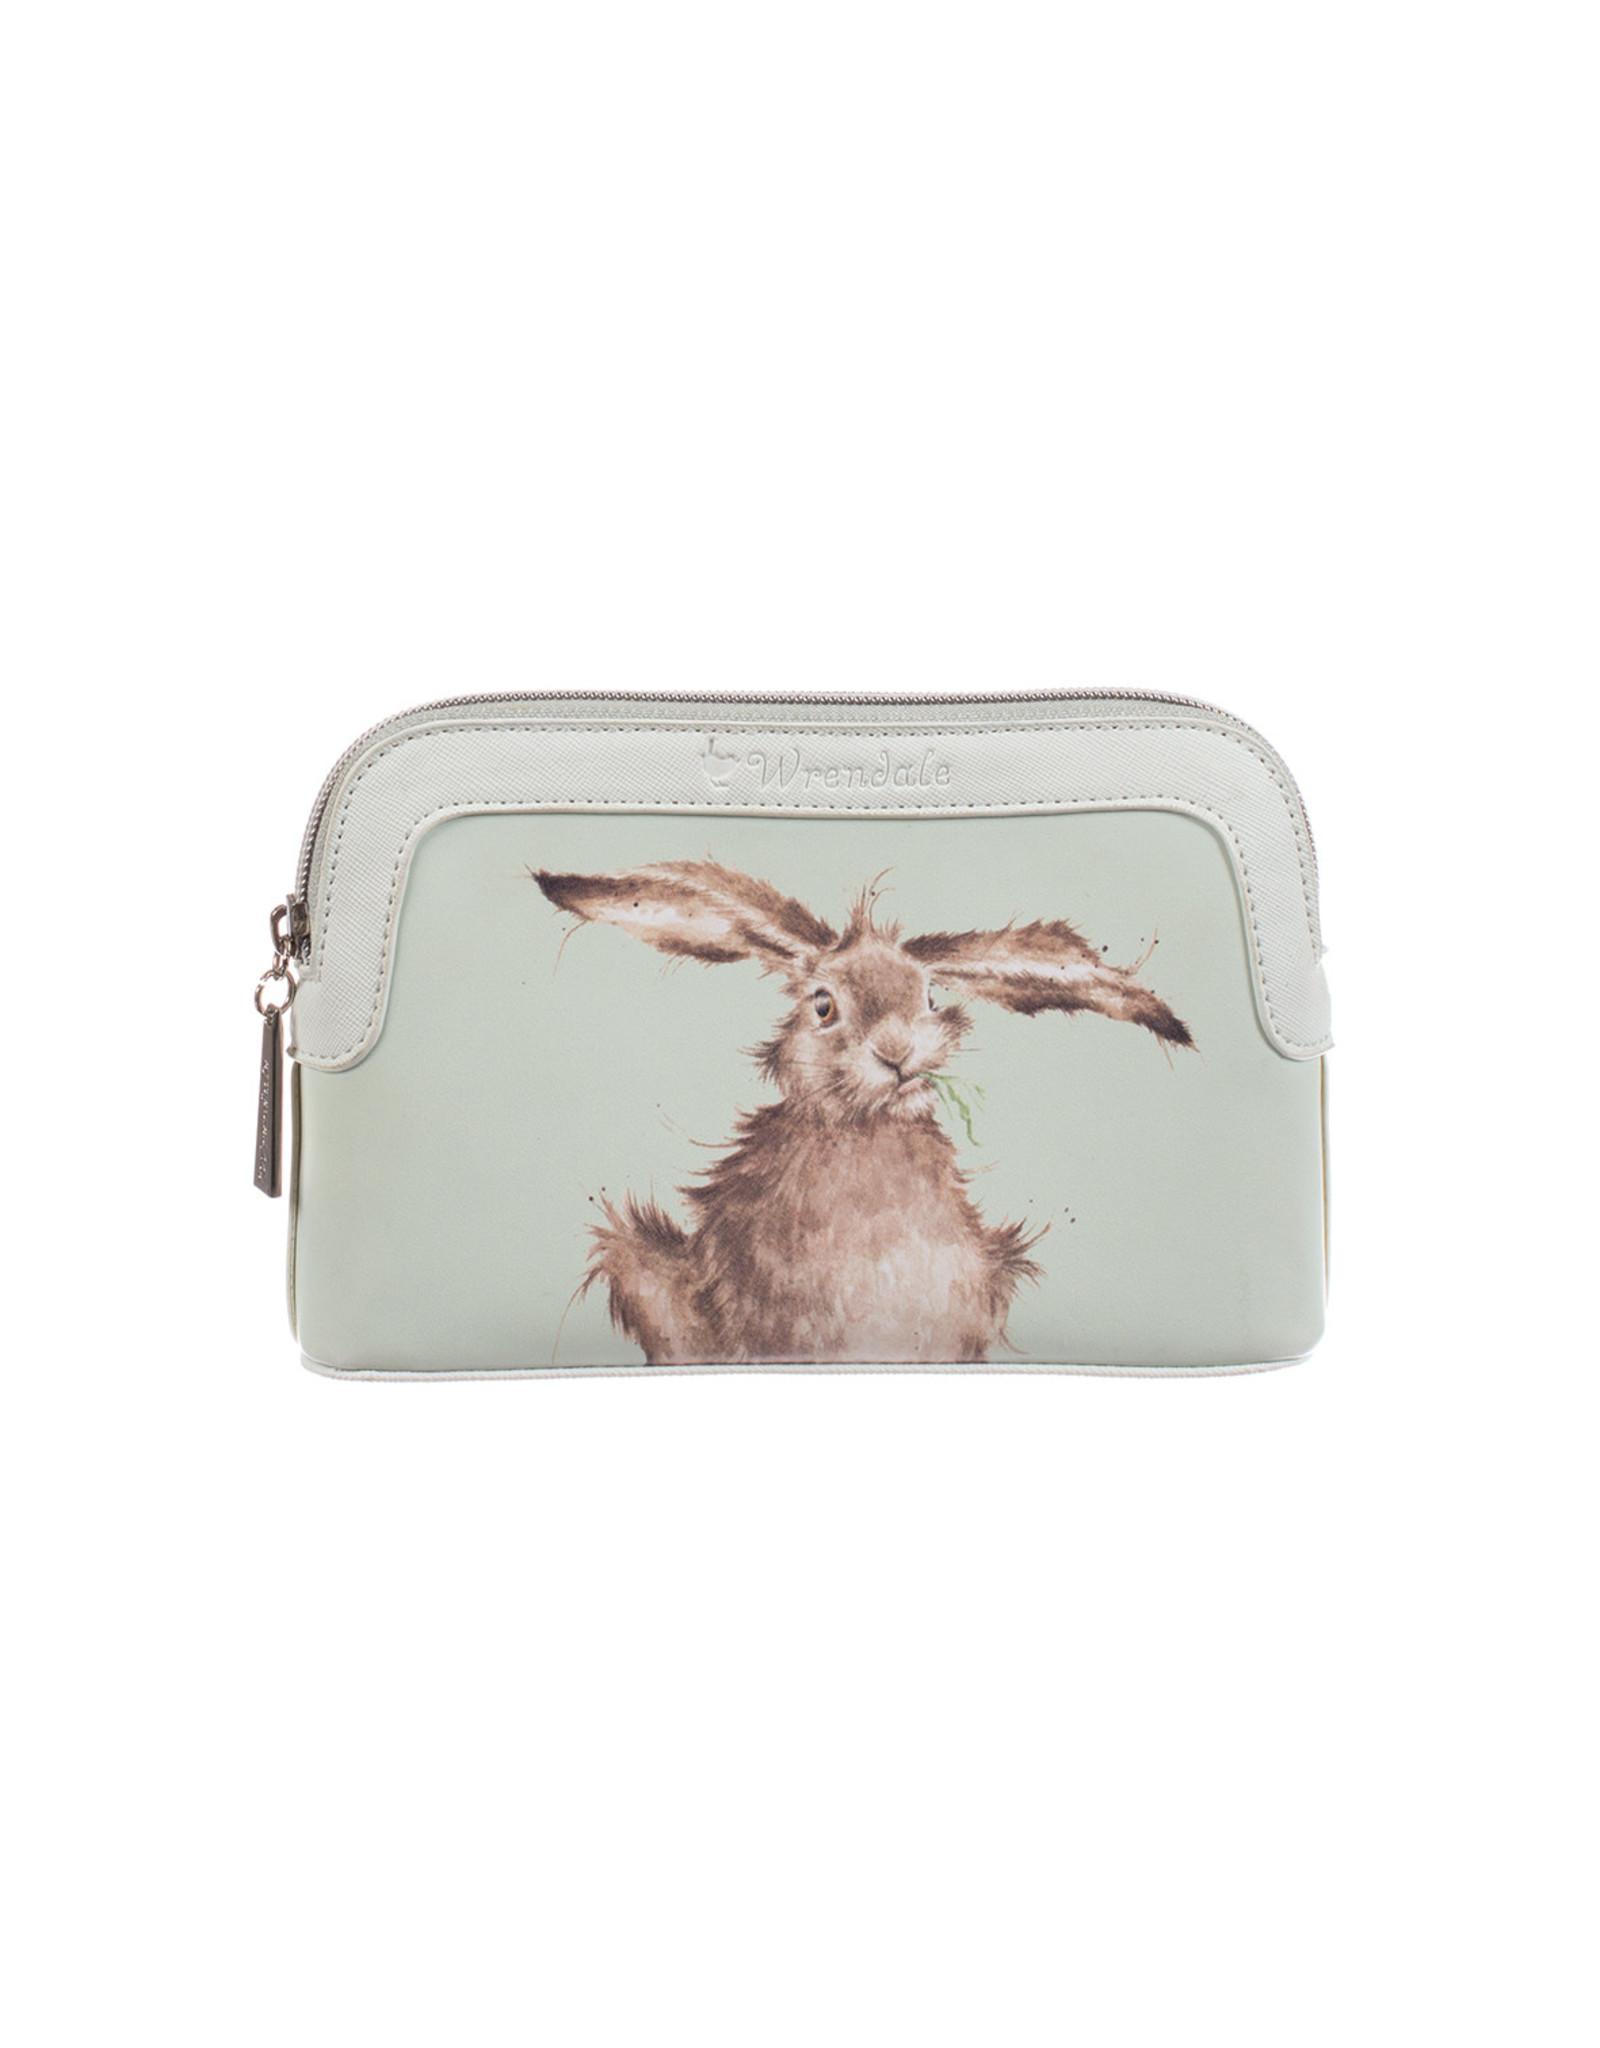 Wrendale Make-uptas - Hare